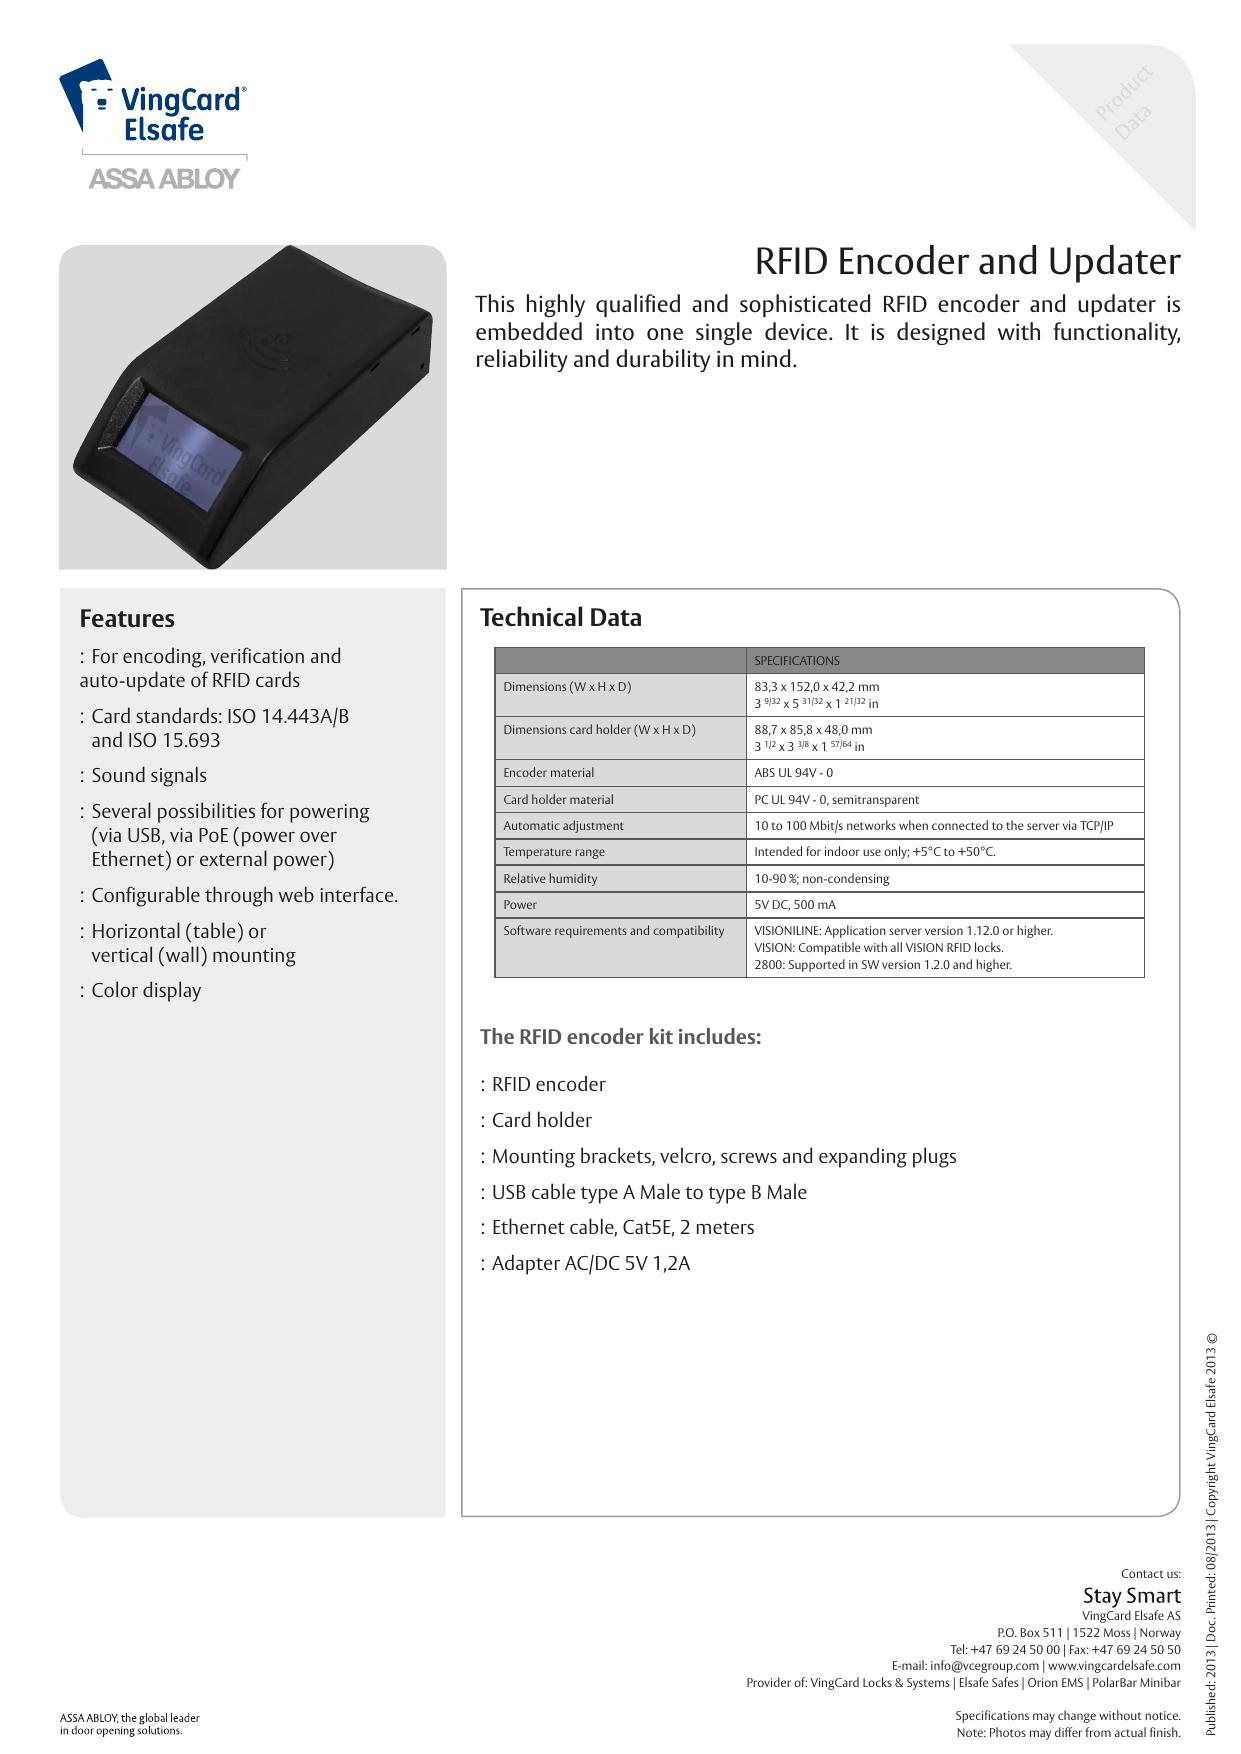 RFID Encoder and Updater | manualzz com